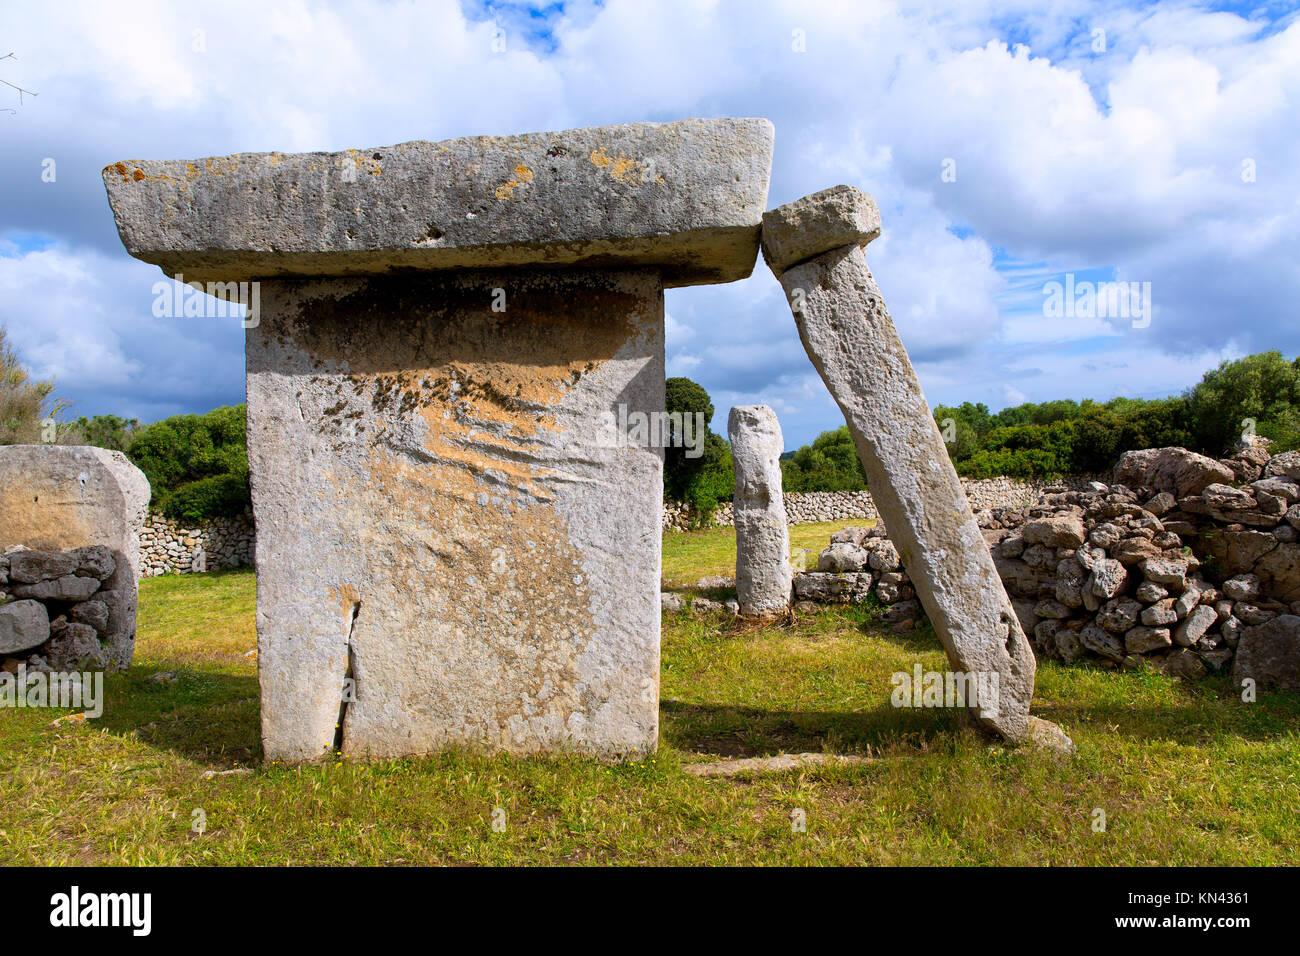 menorca Taules of Talati de Dalt prehistoric tables in Balearic islands. - Stock Image